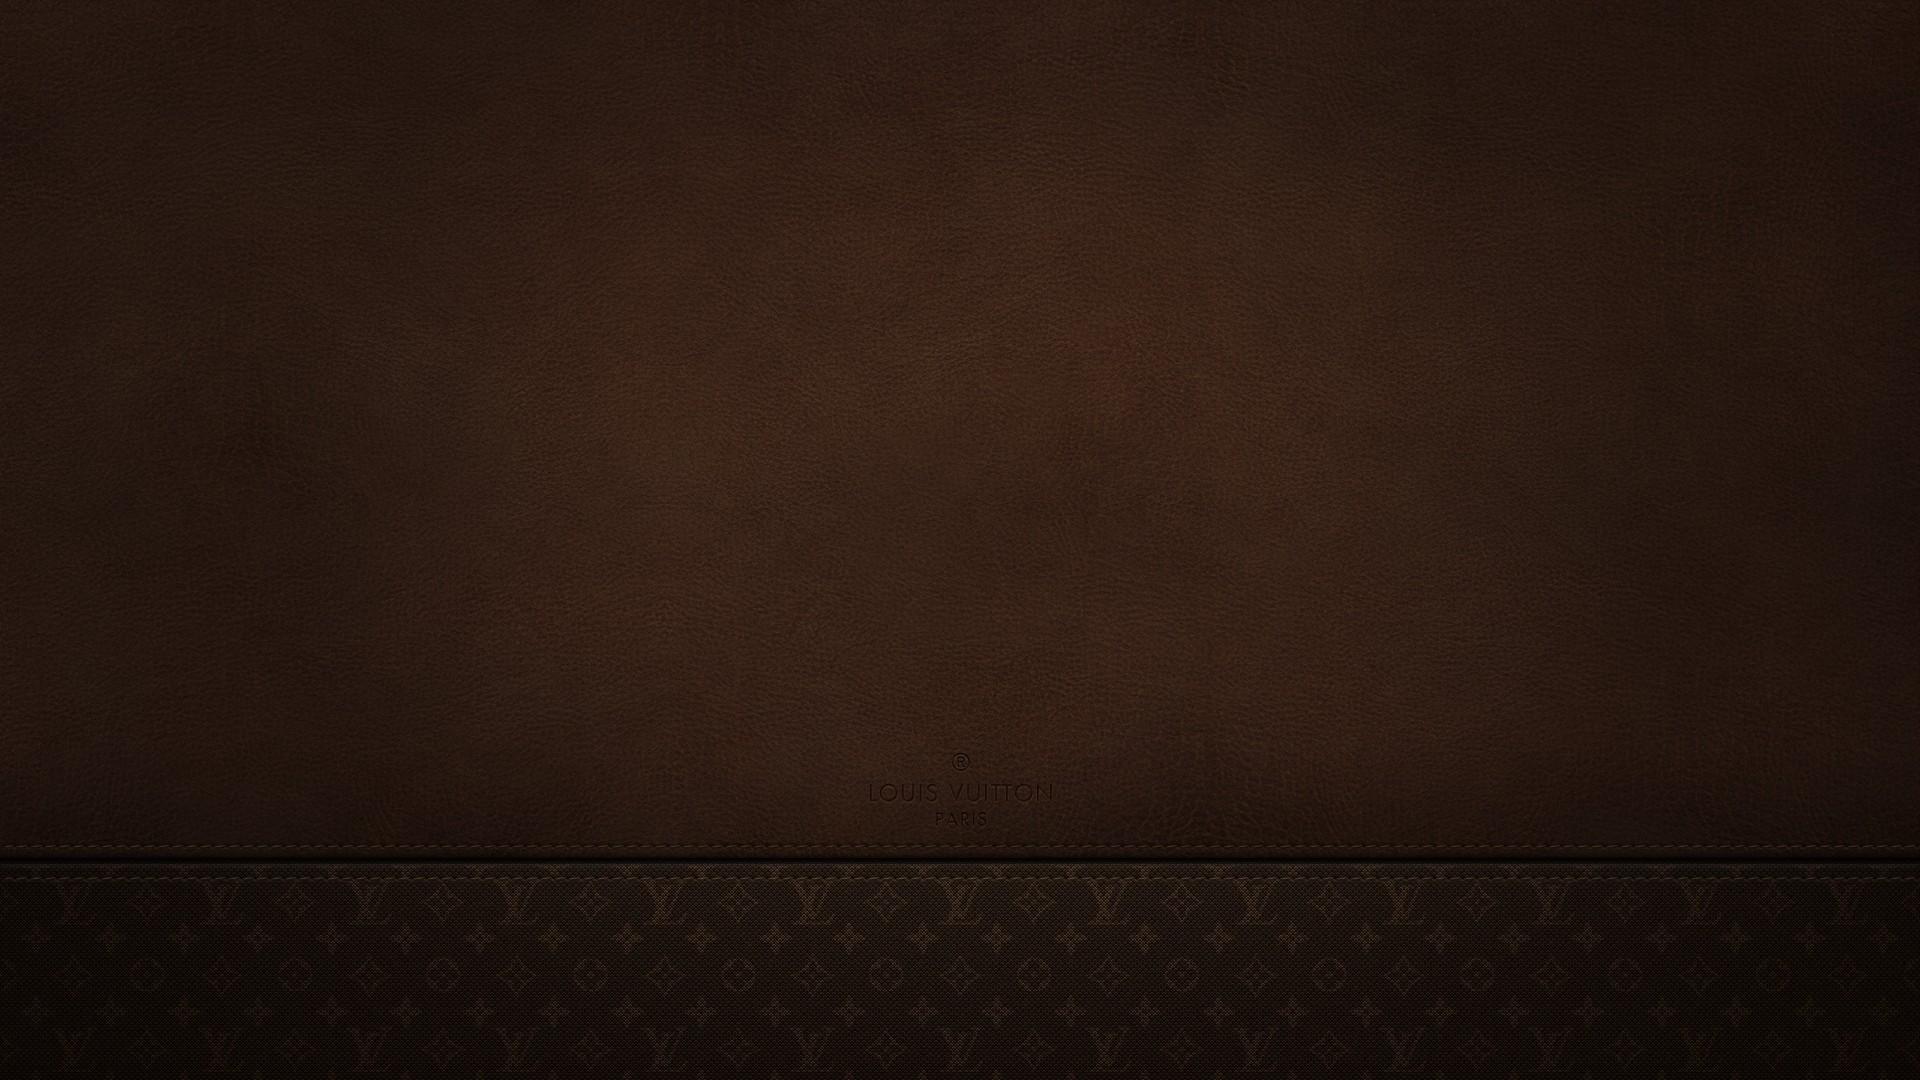 Wallpaper louis vuitton, leather, brand